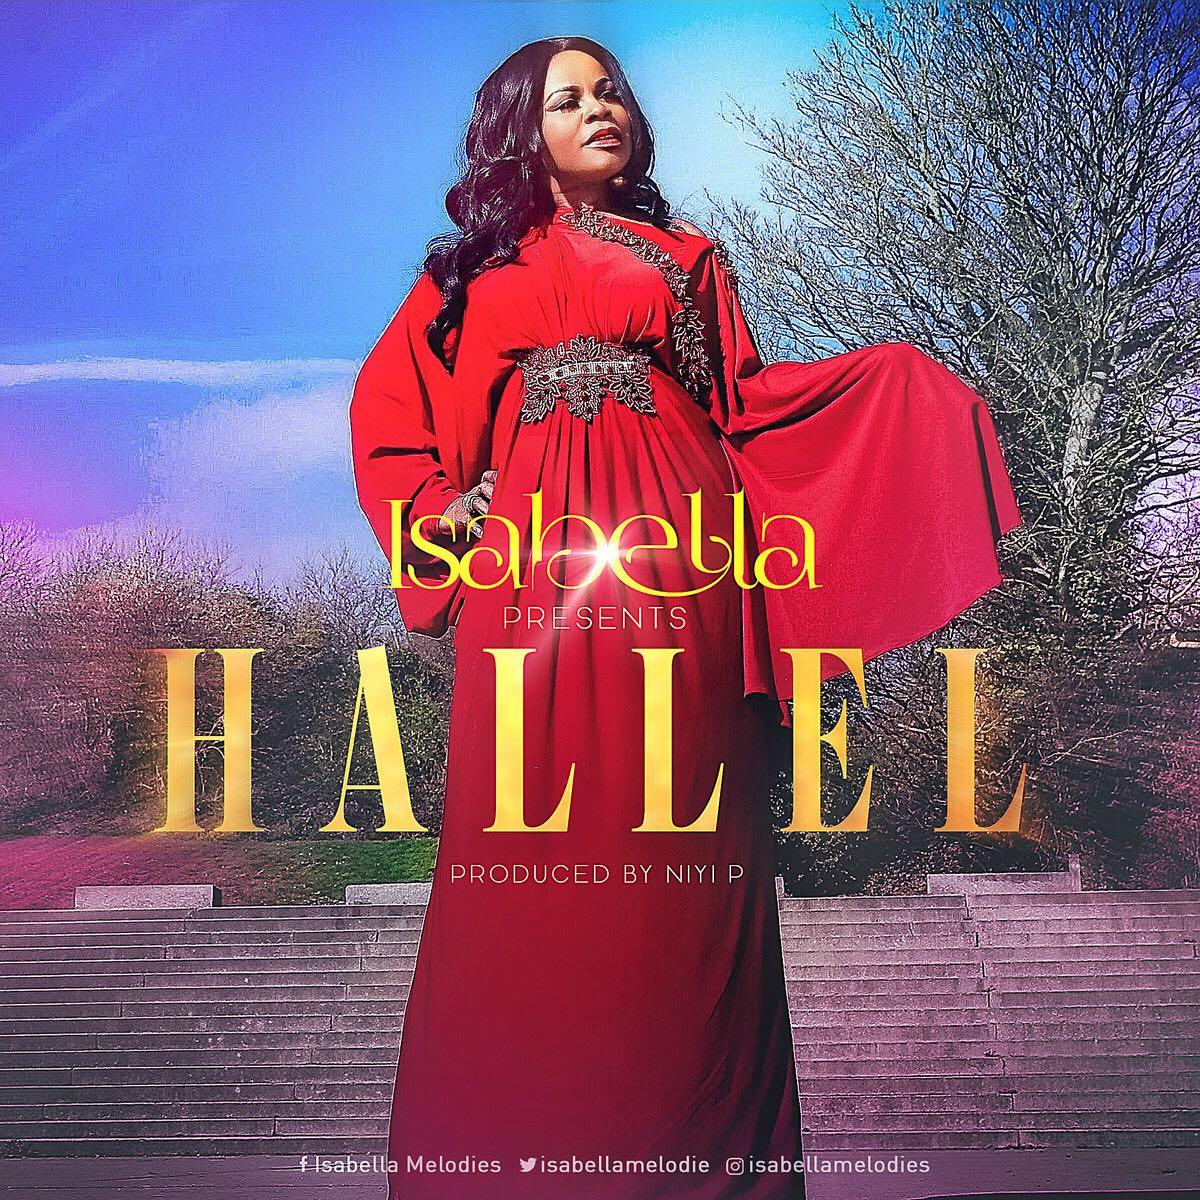 Hallel Isabella - Gospelminds.com